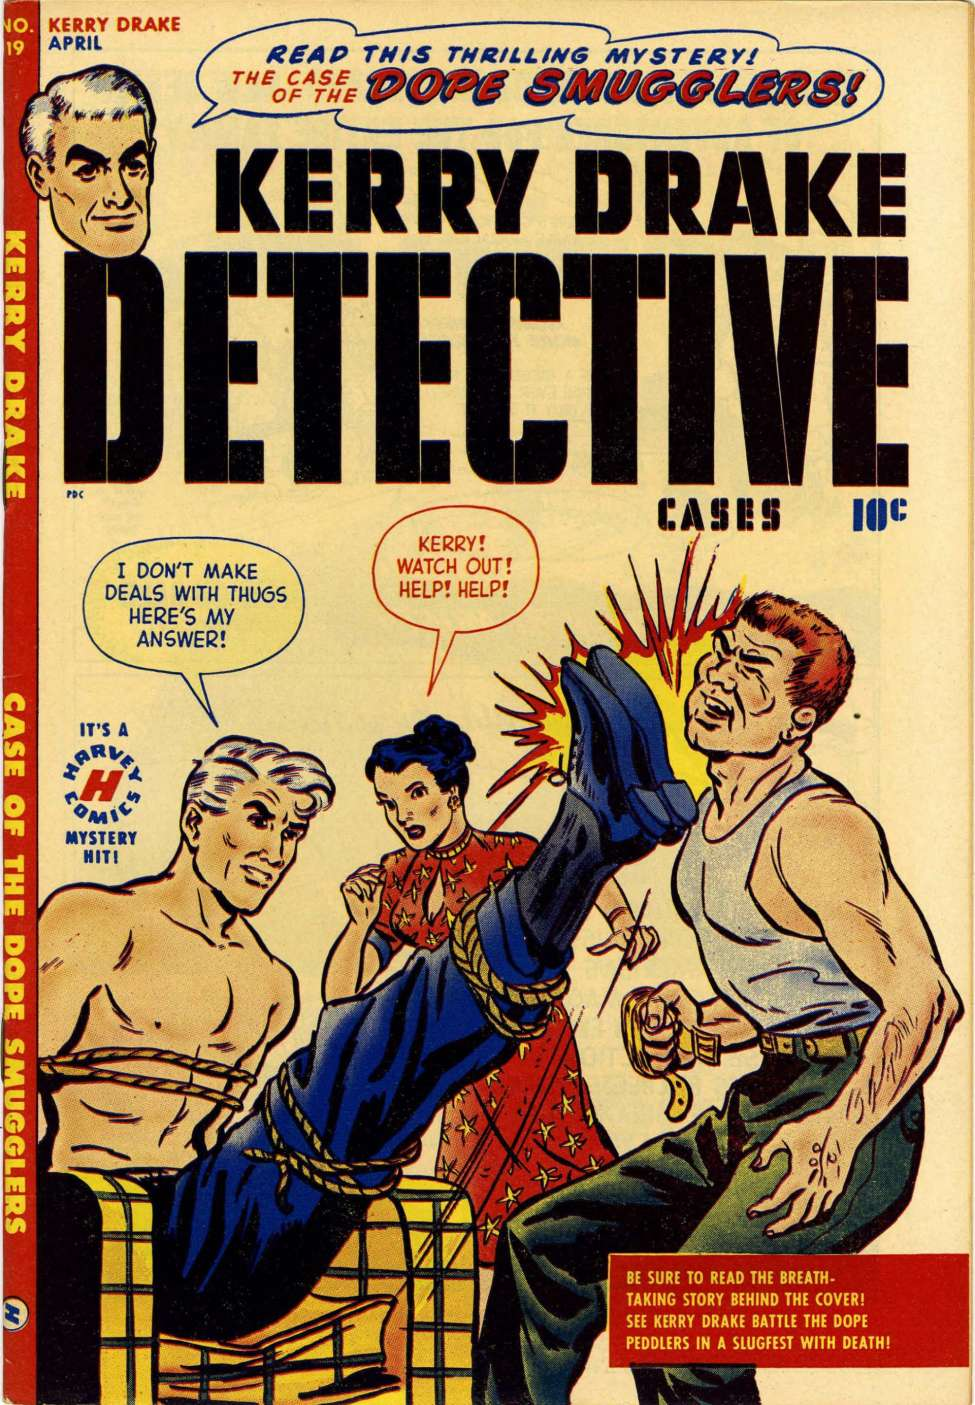 Kerry Drake, l'autre série policière d'Alfred Andriola - Page 4 0_210